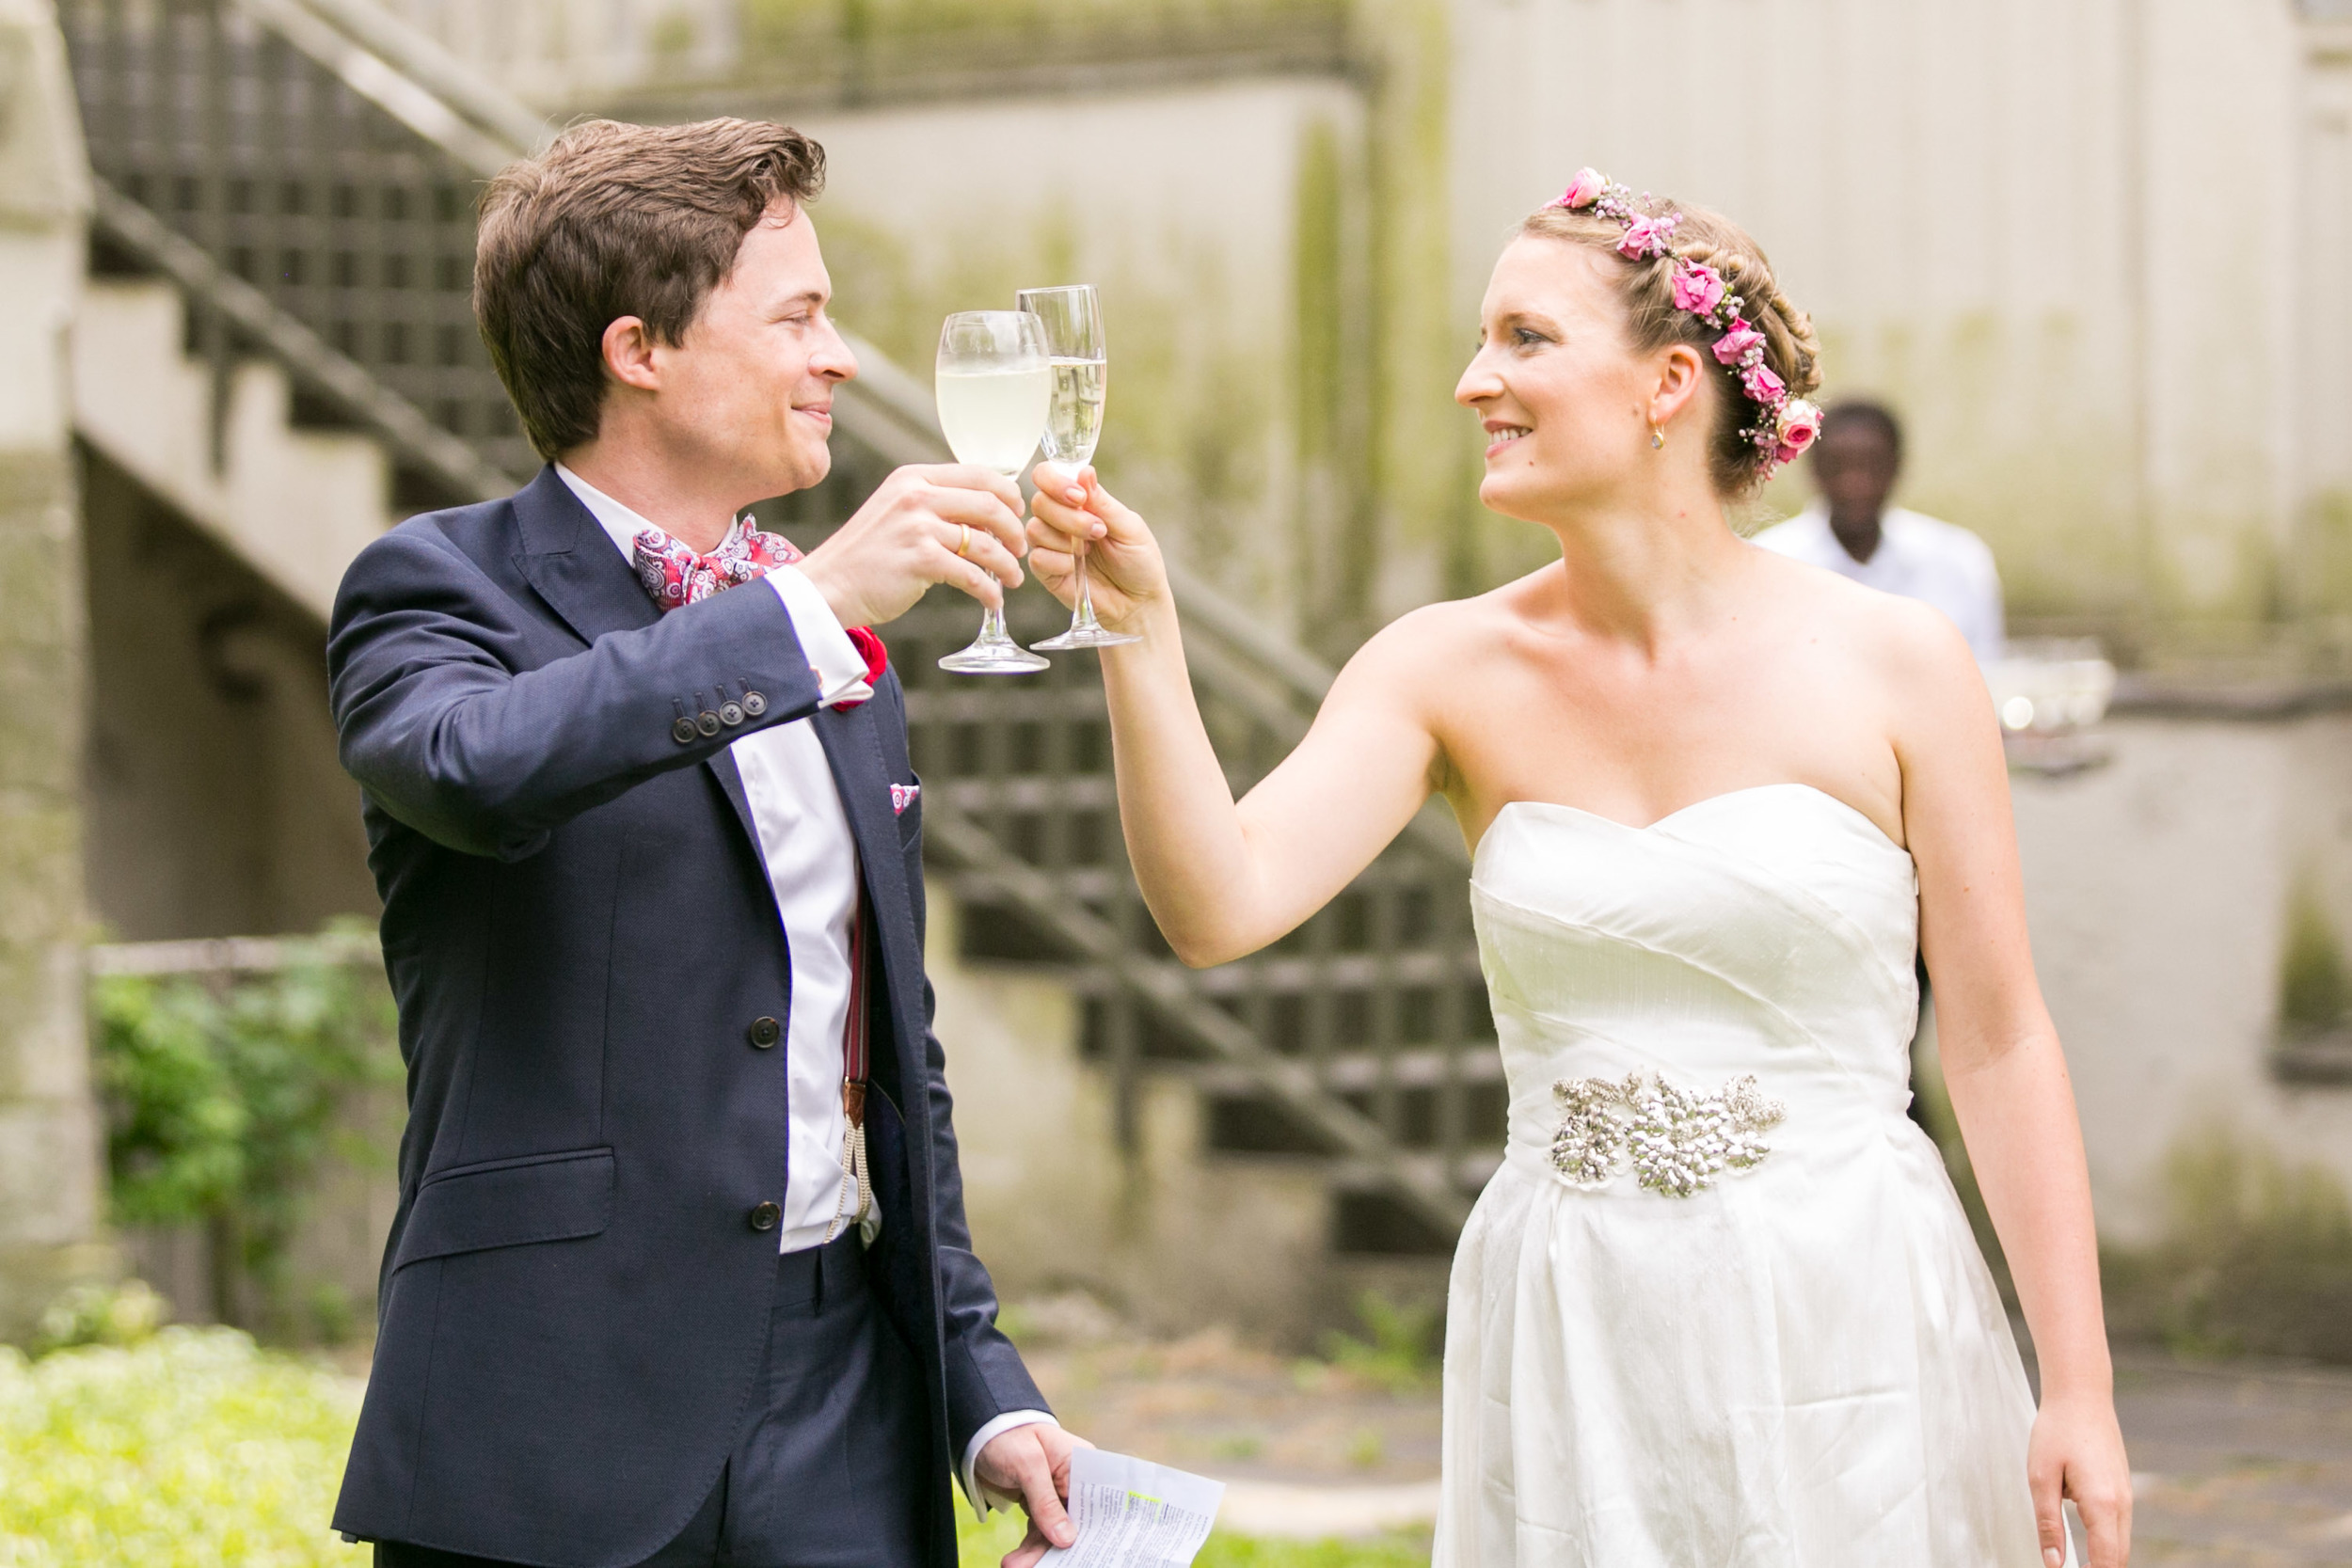 Fran Burrows Berlin Hochzeitsfotografie-39.jpg